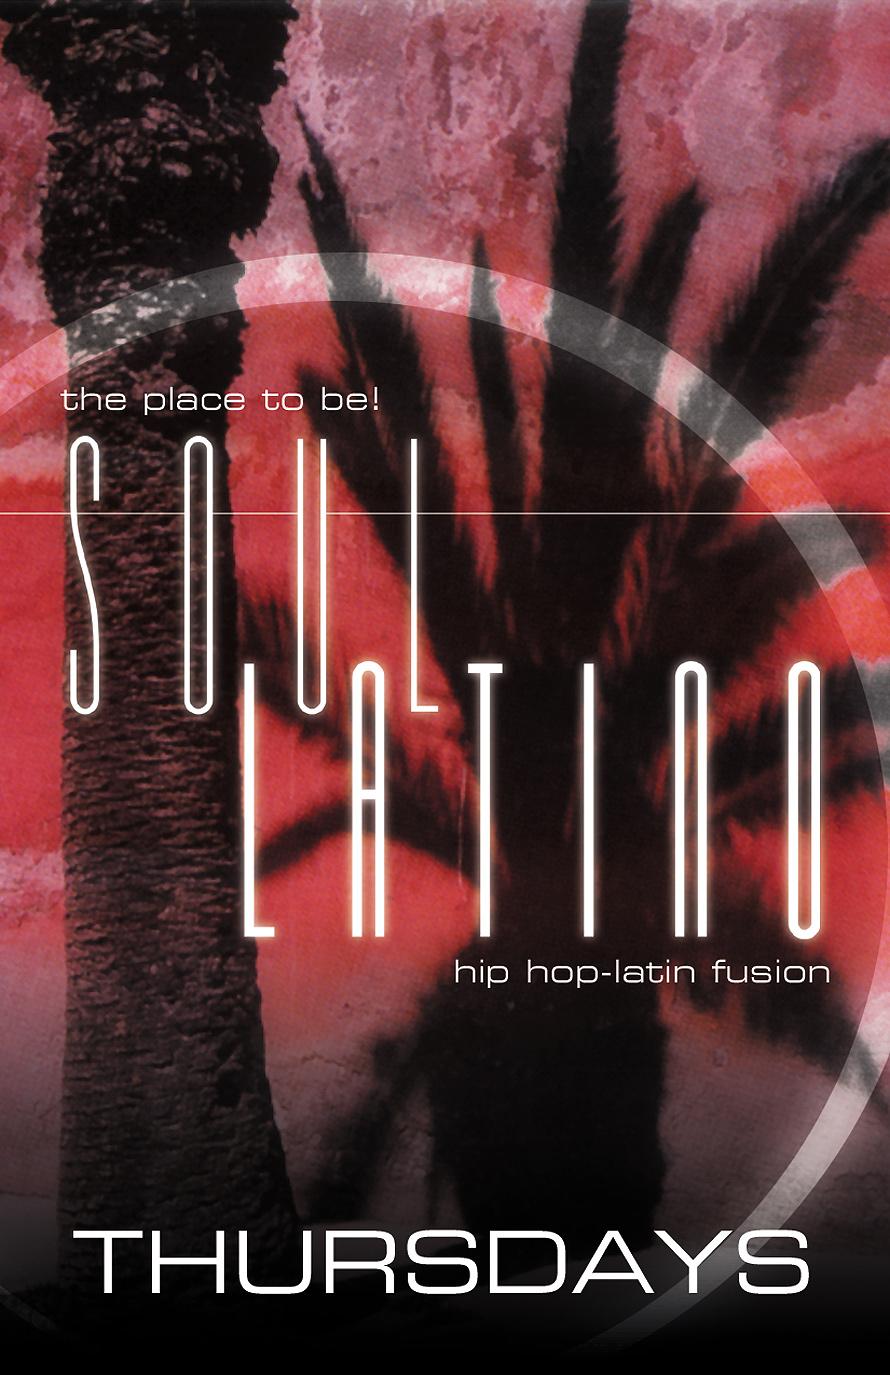 Soul Latino Hip Hop Latin Fusion